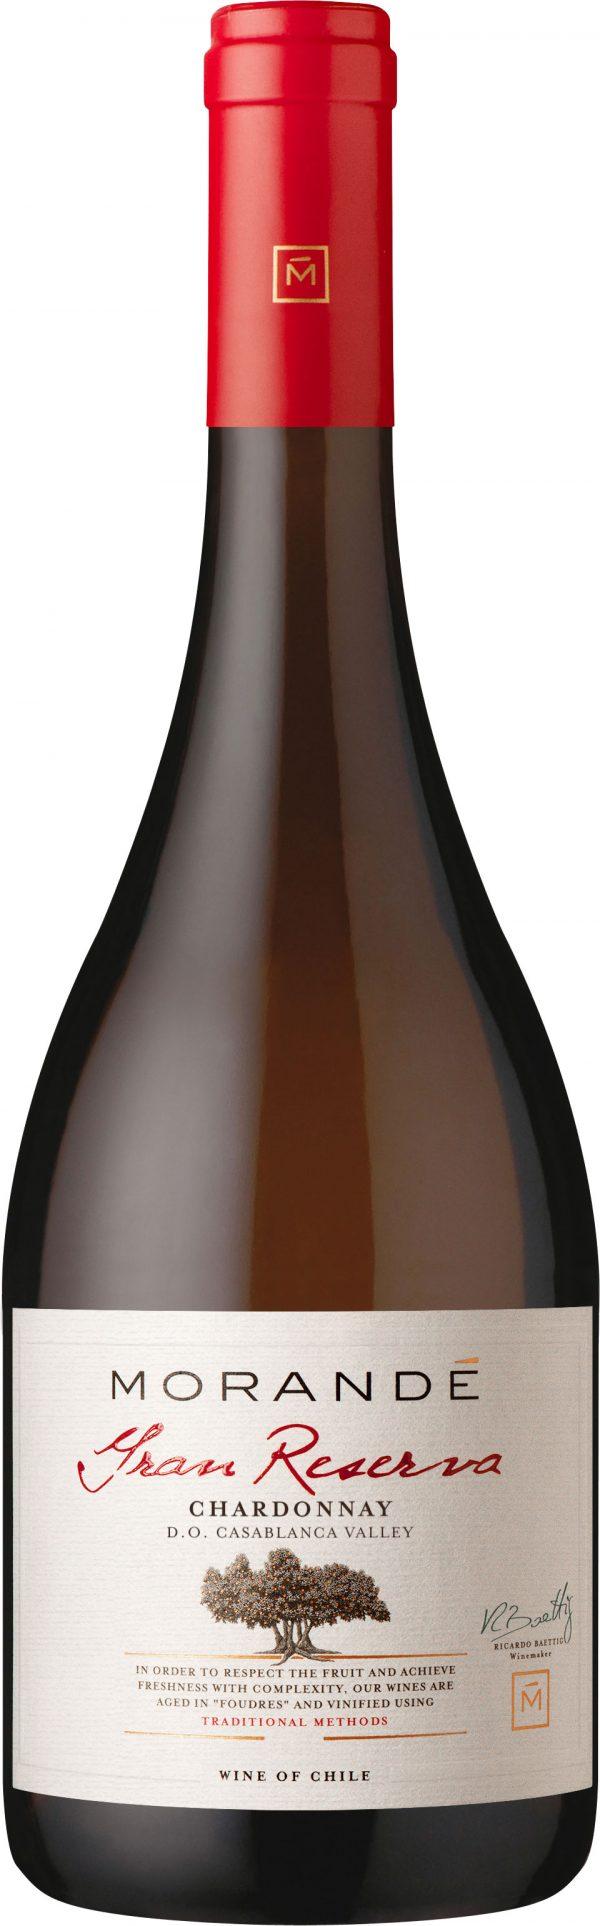 Morande - Gran Reserva Chardonnay 2015 75cl Bottle